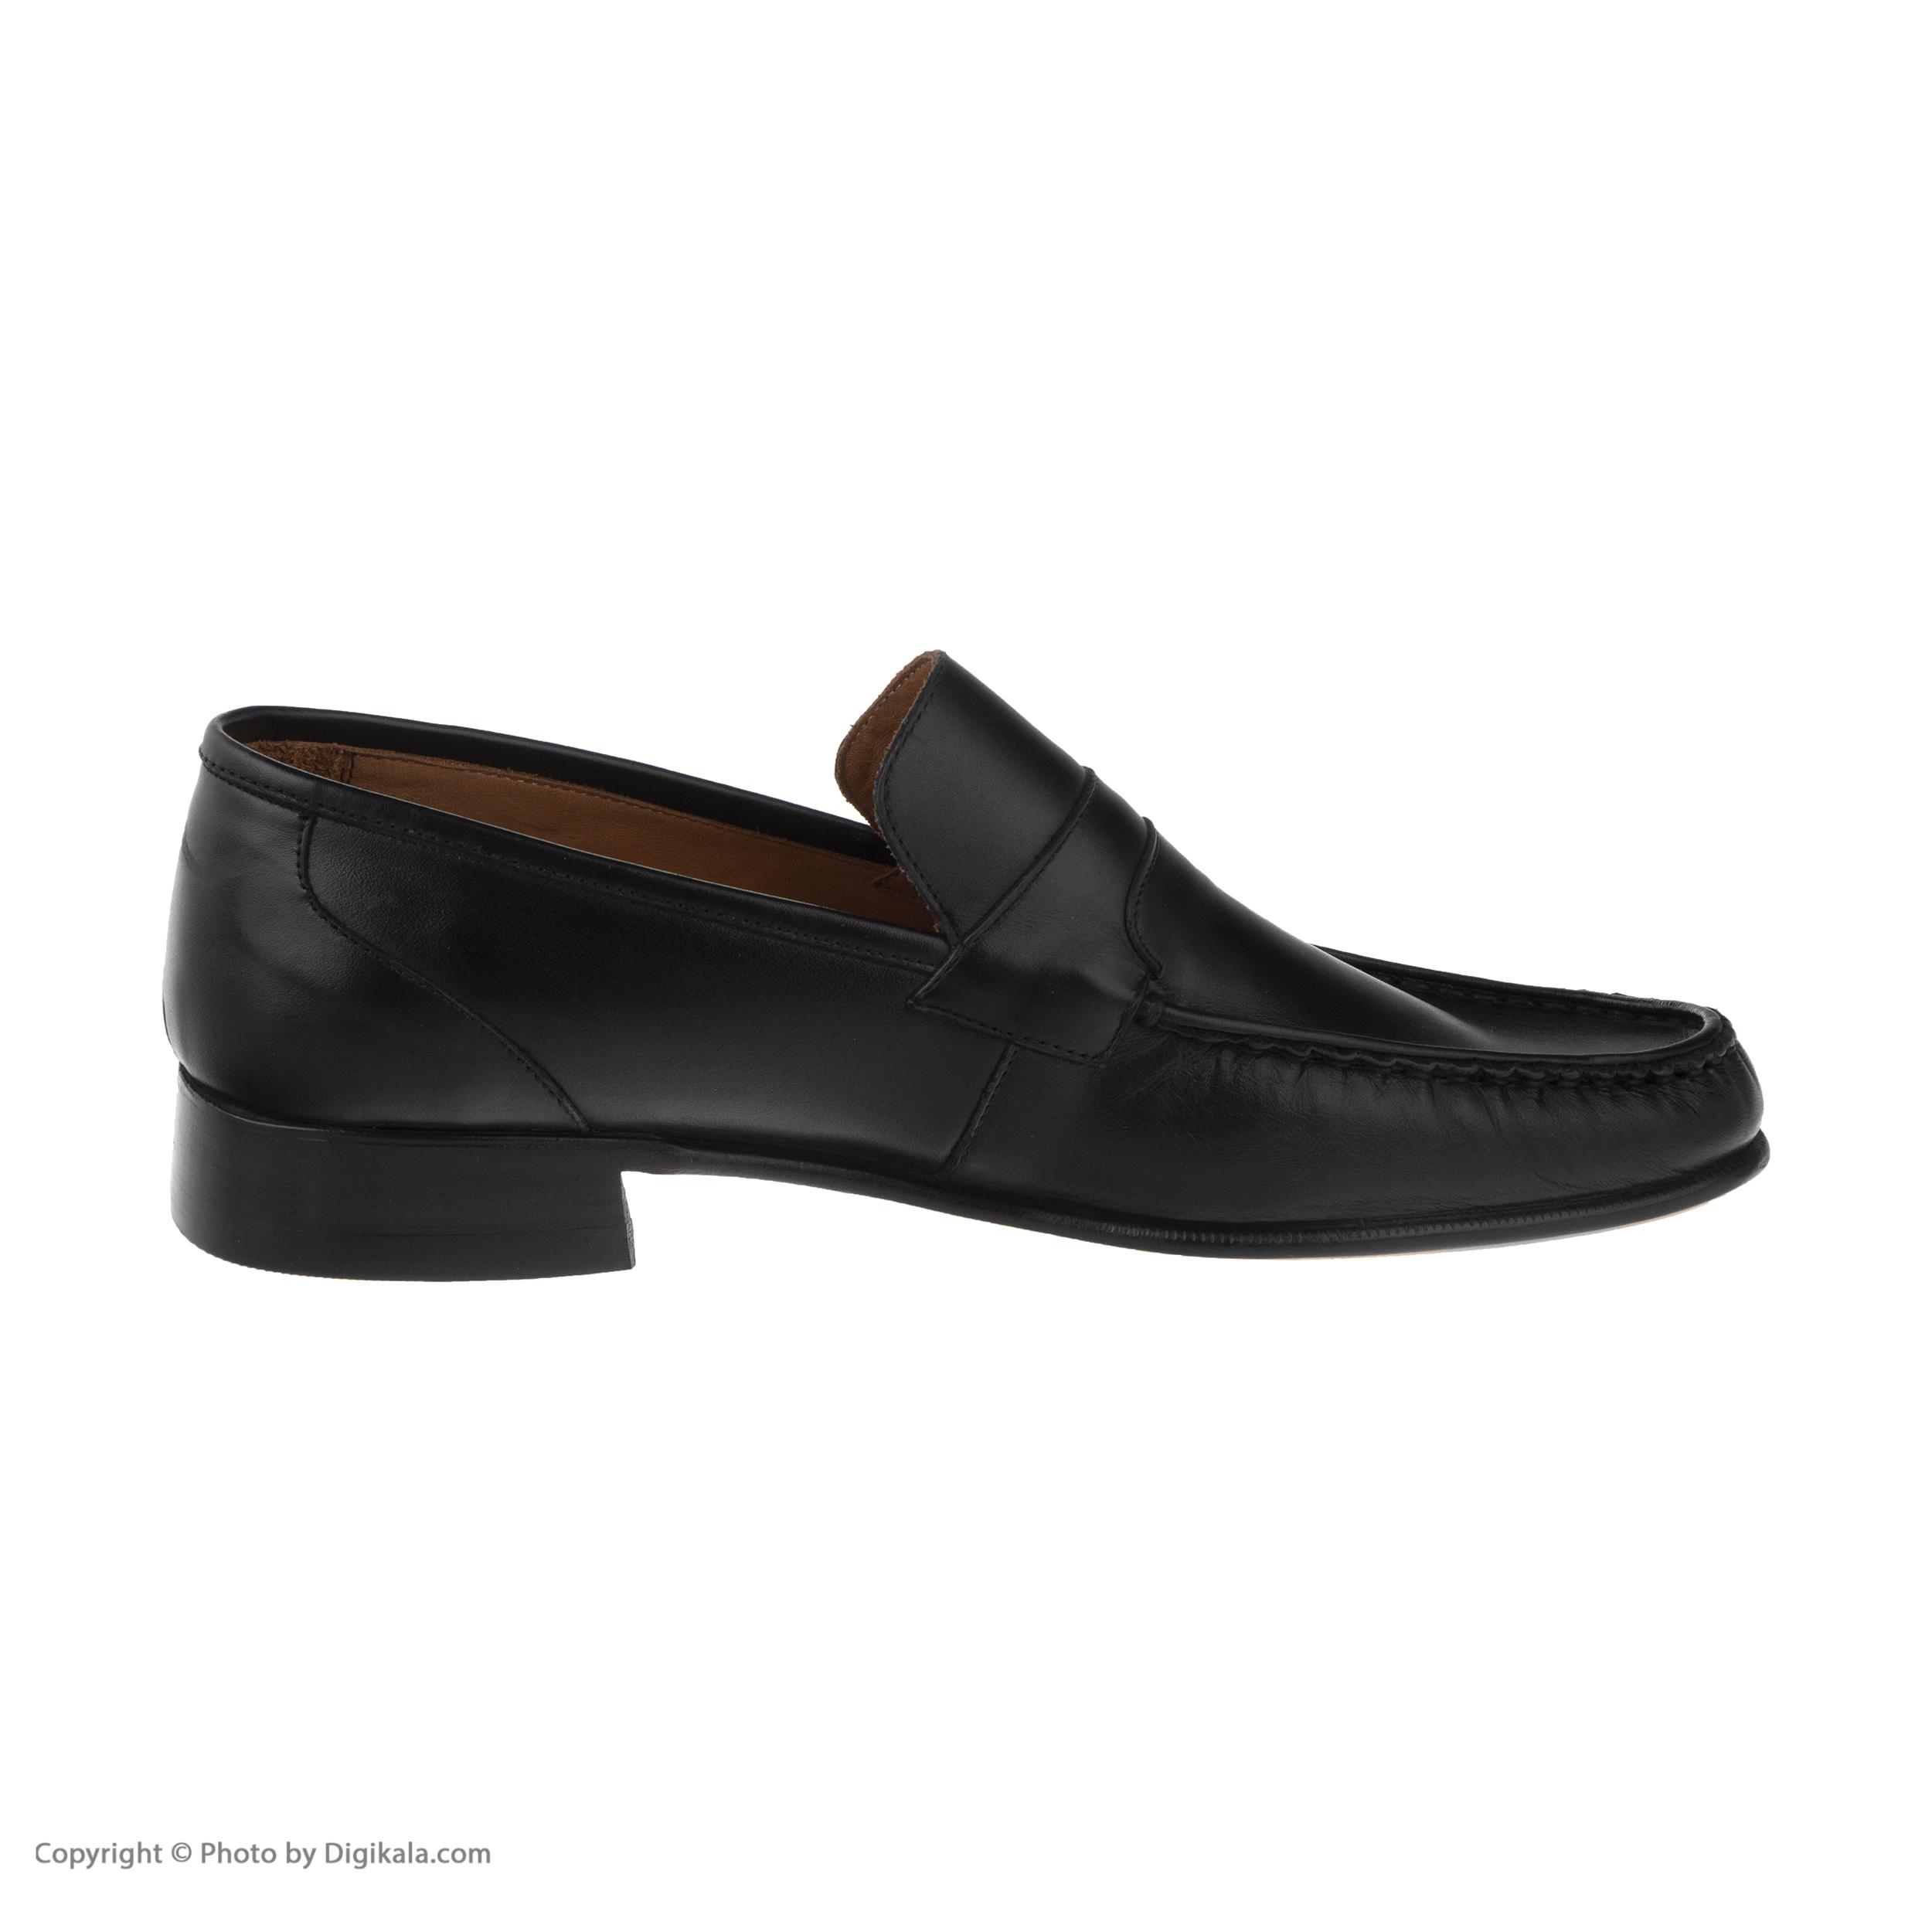 کفش مردانه نظری کد 409 -  - 5